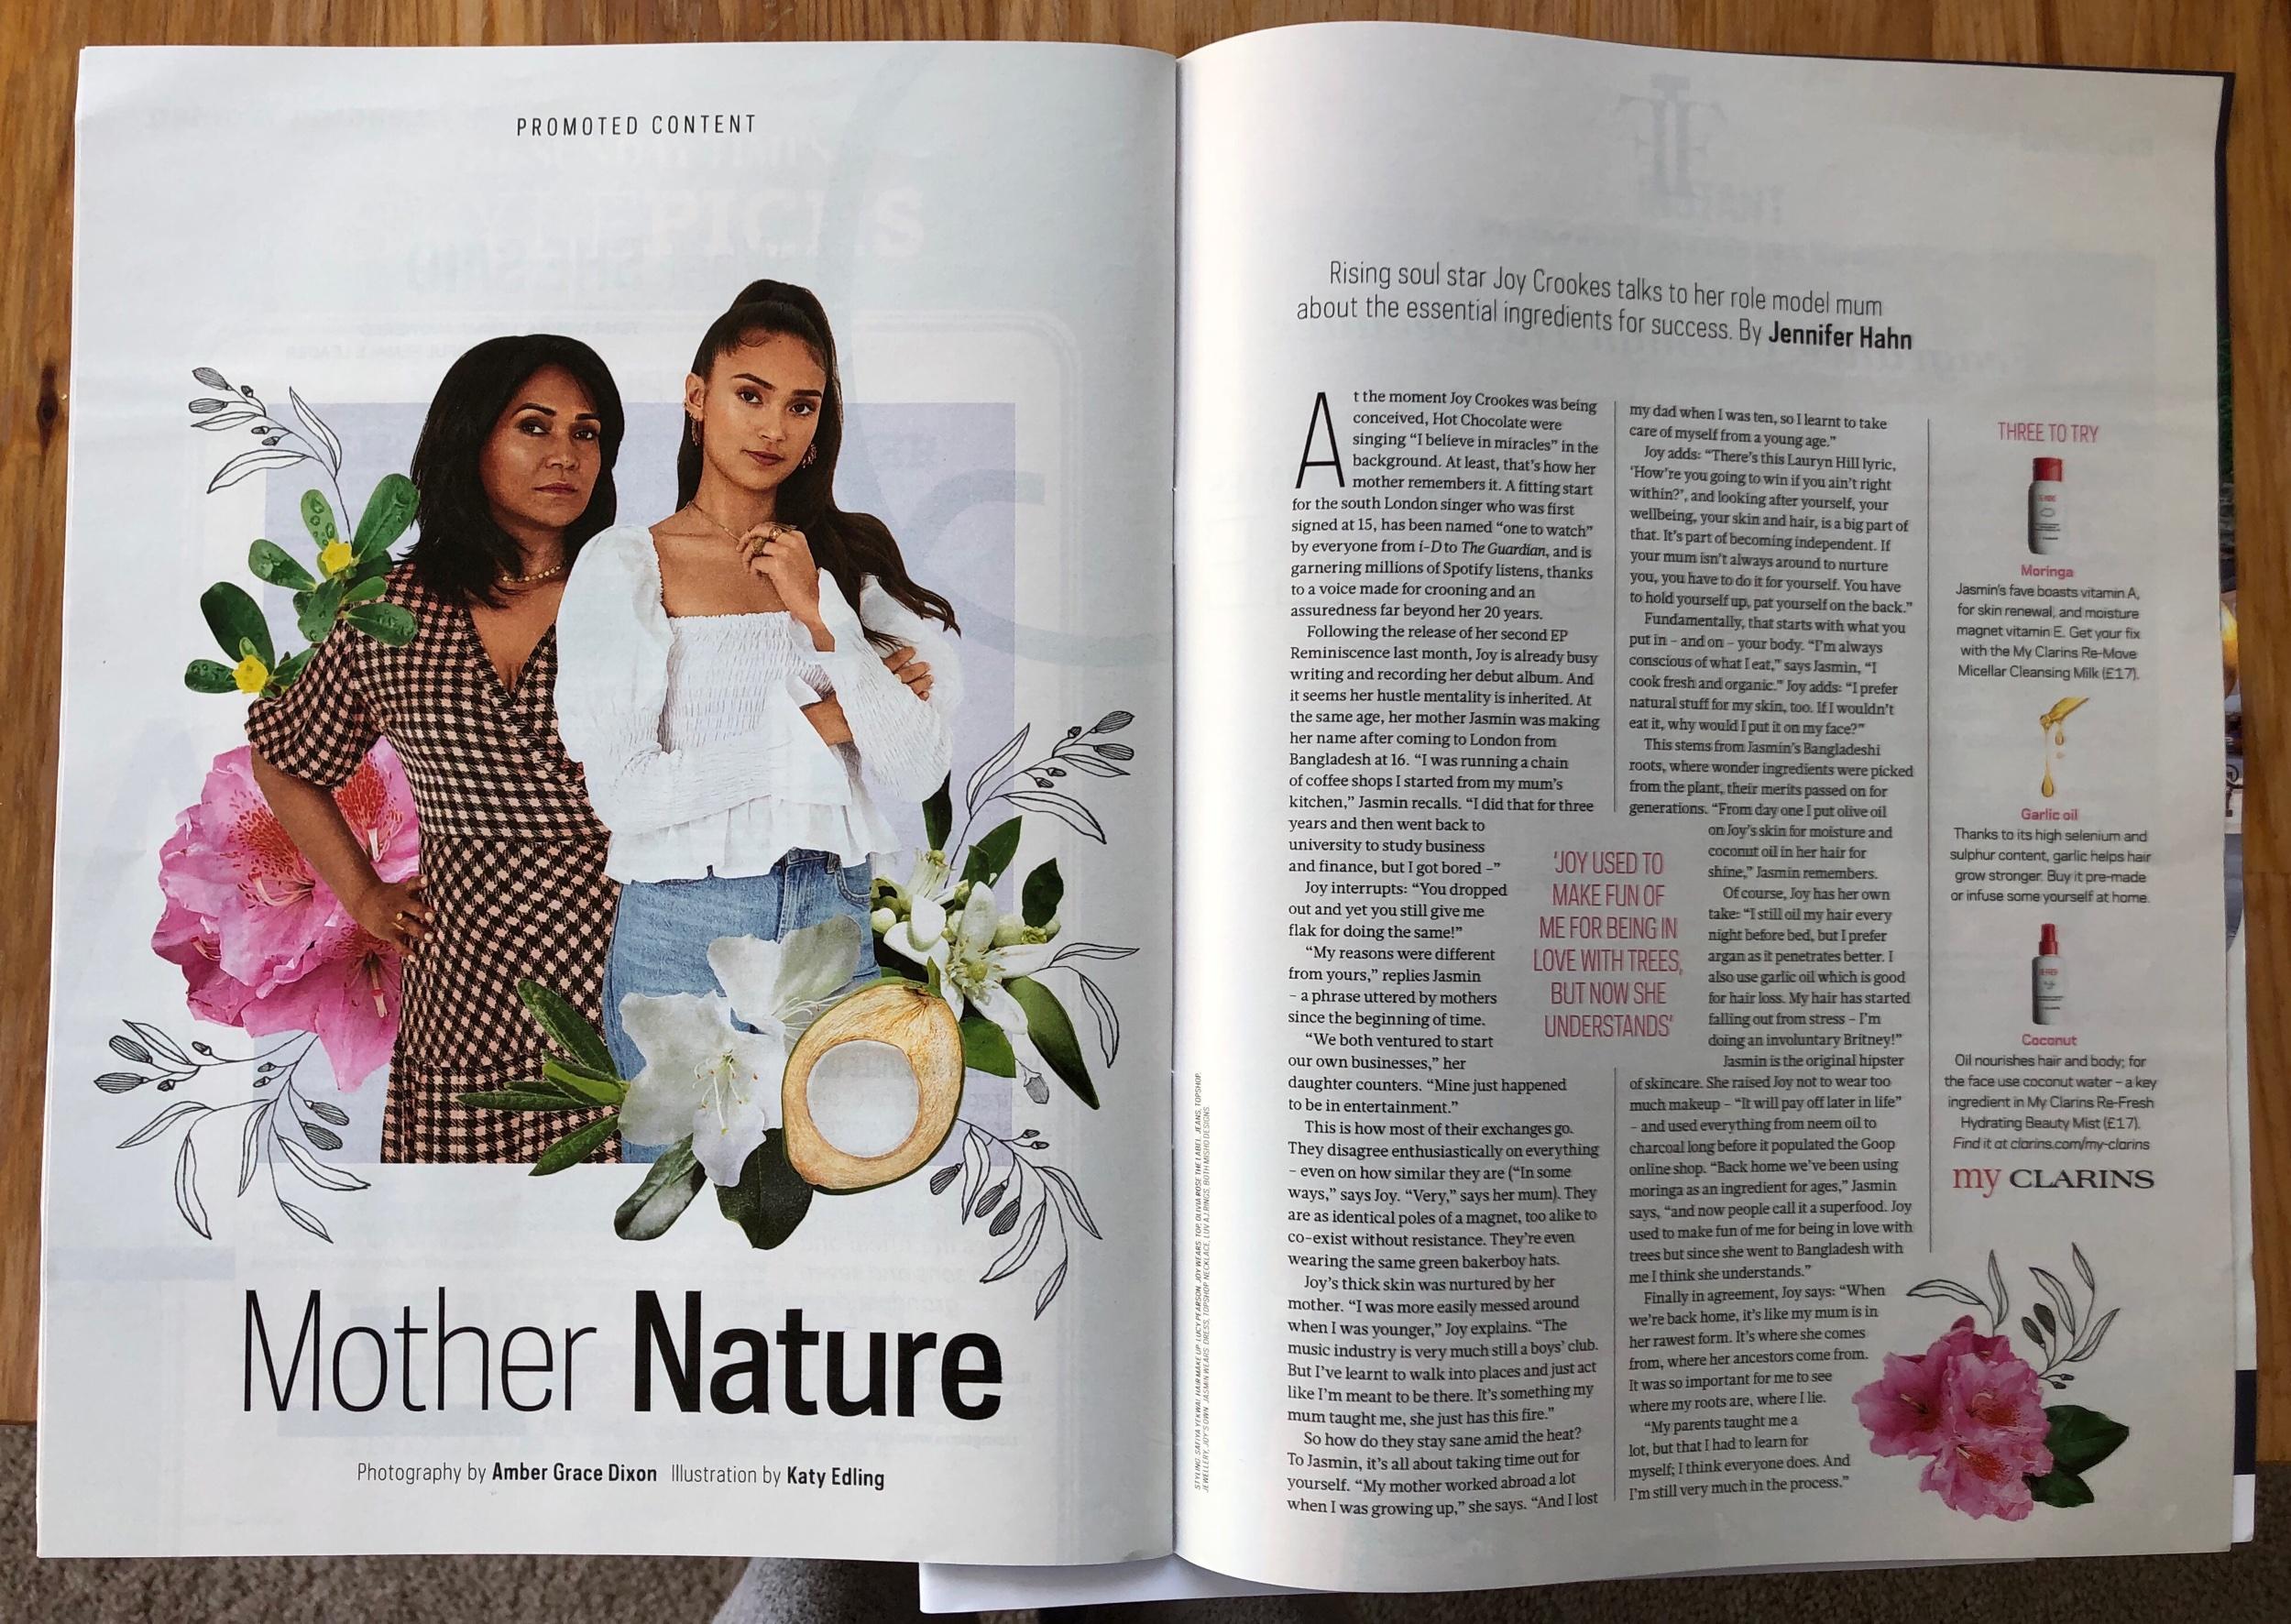 Sunday Times Style x Clarins | Jasmine & Joy Crookes